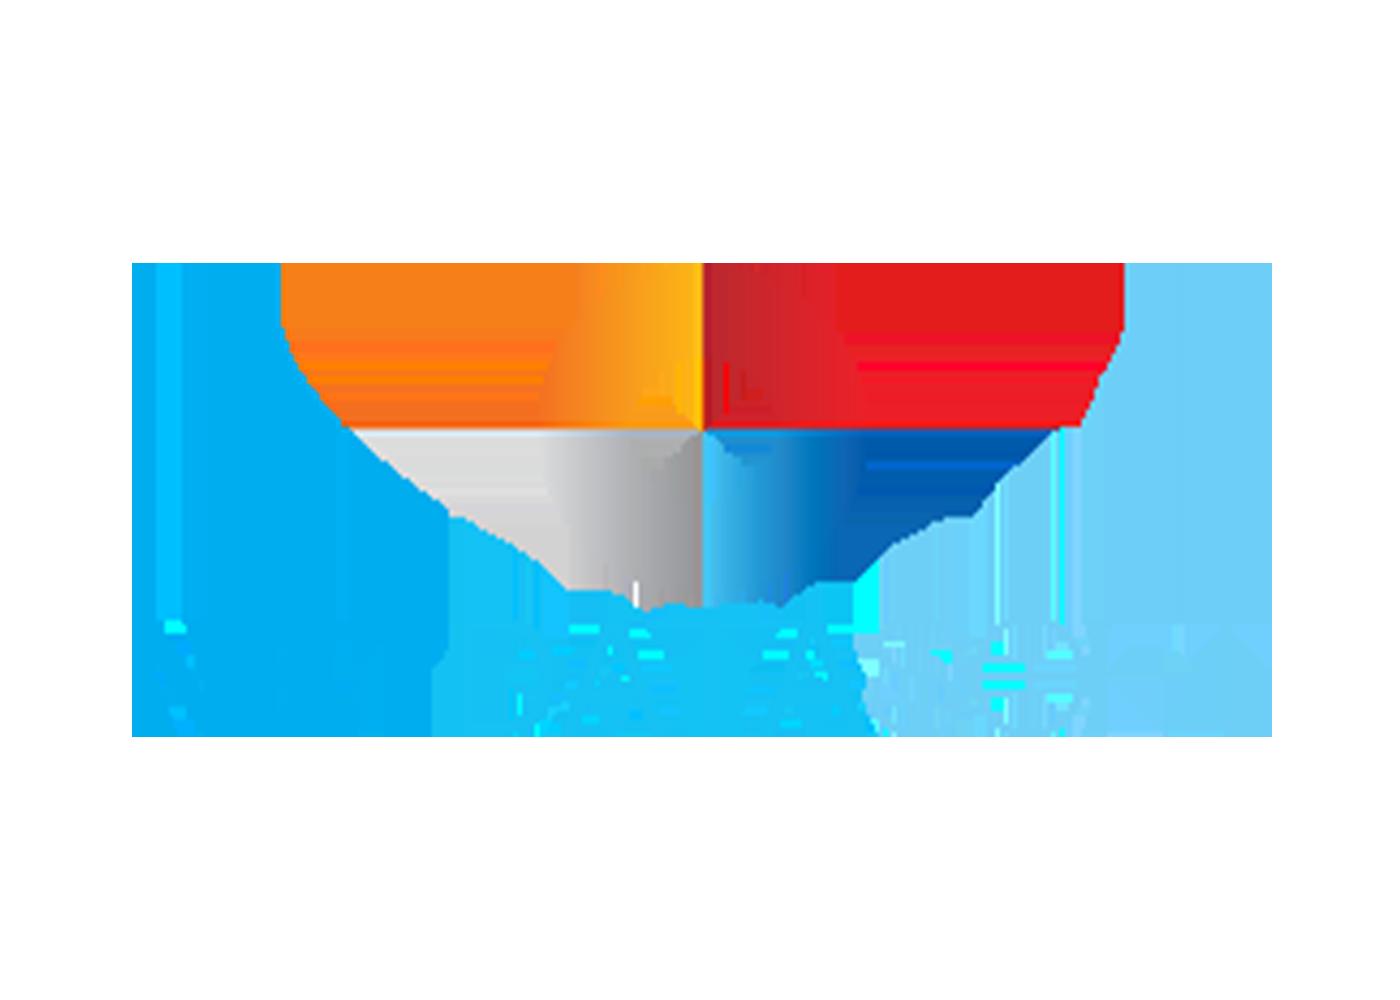 bilgi-guvenligi-netdata-renkli